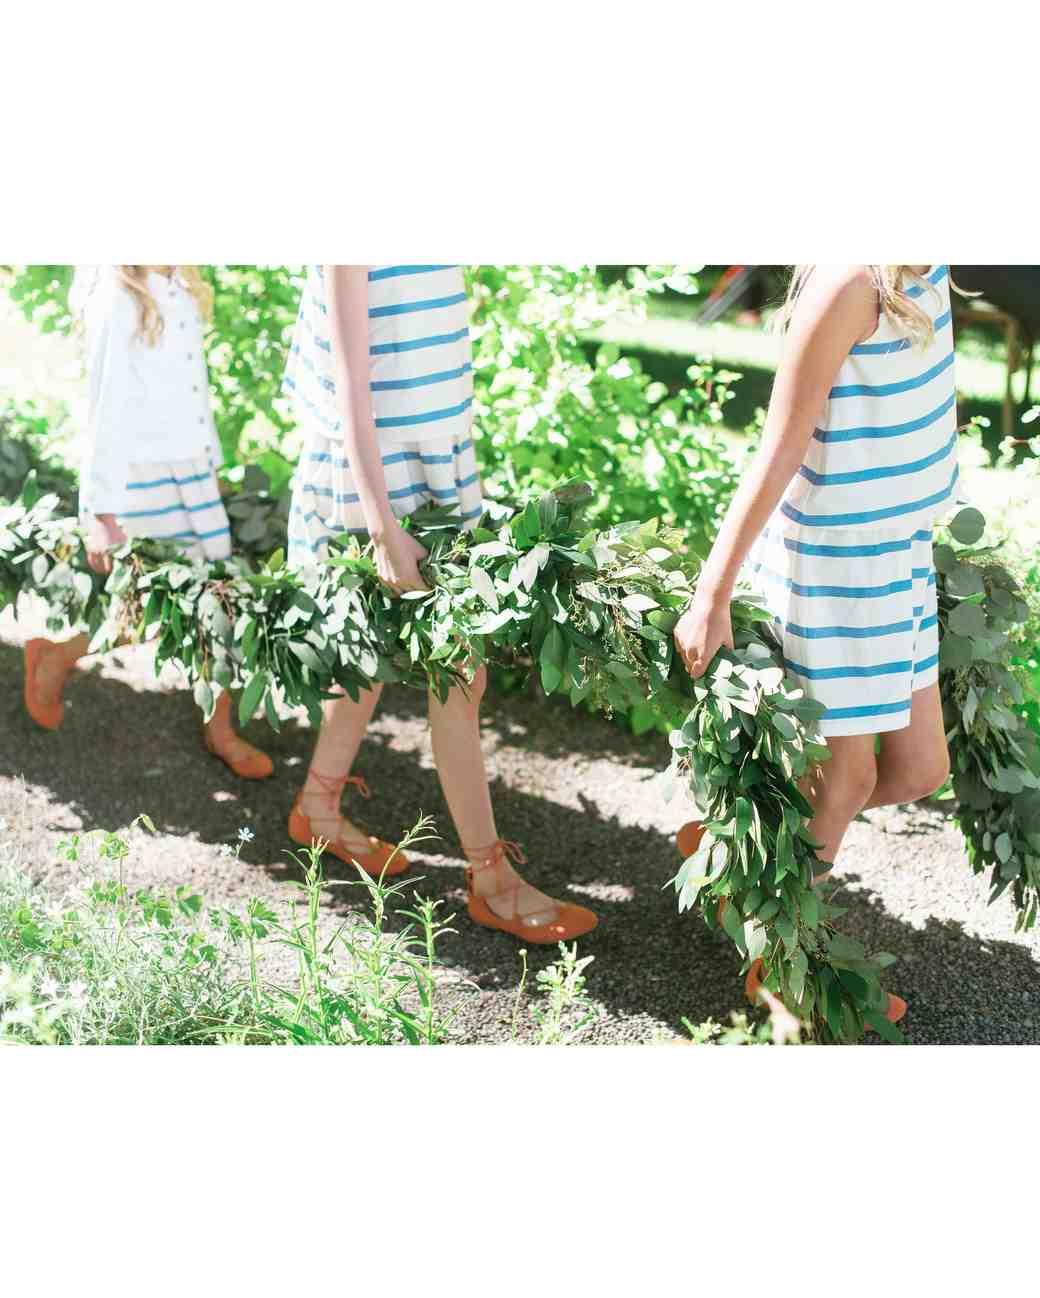 kids carrying garland